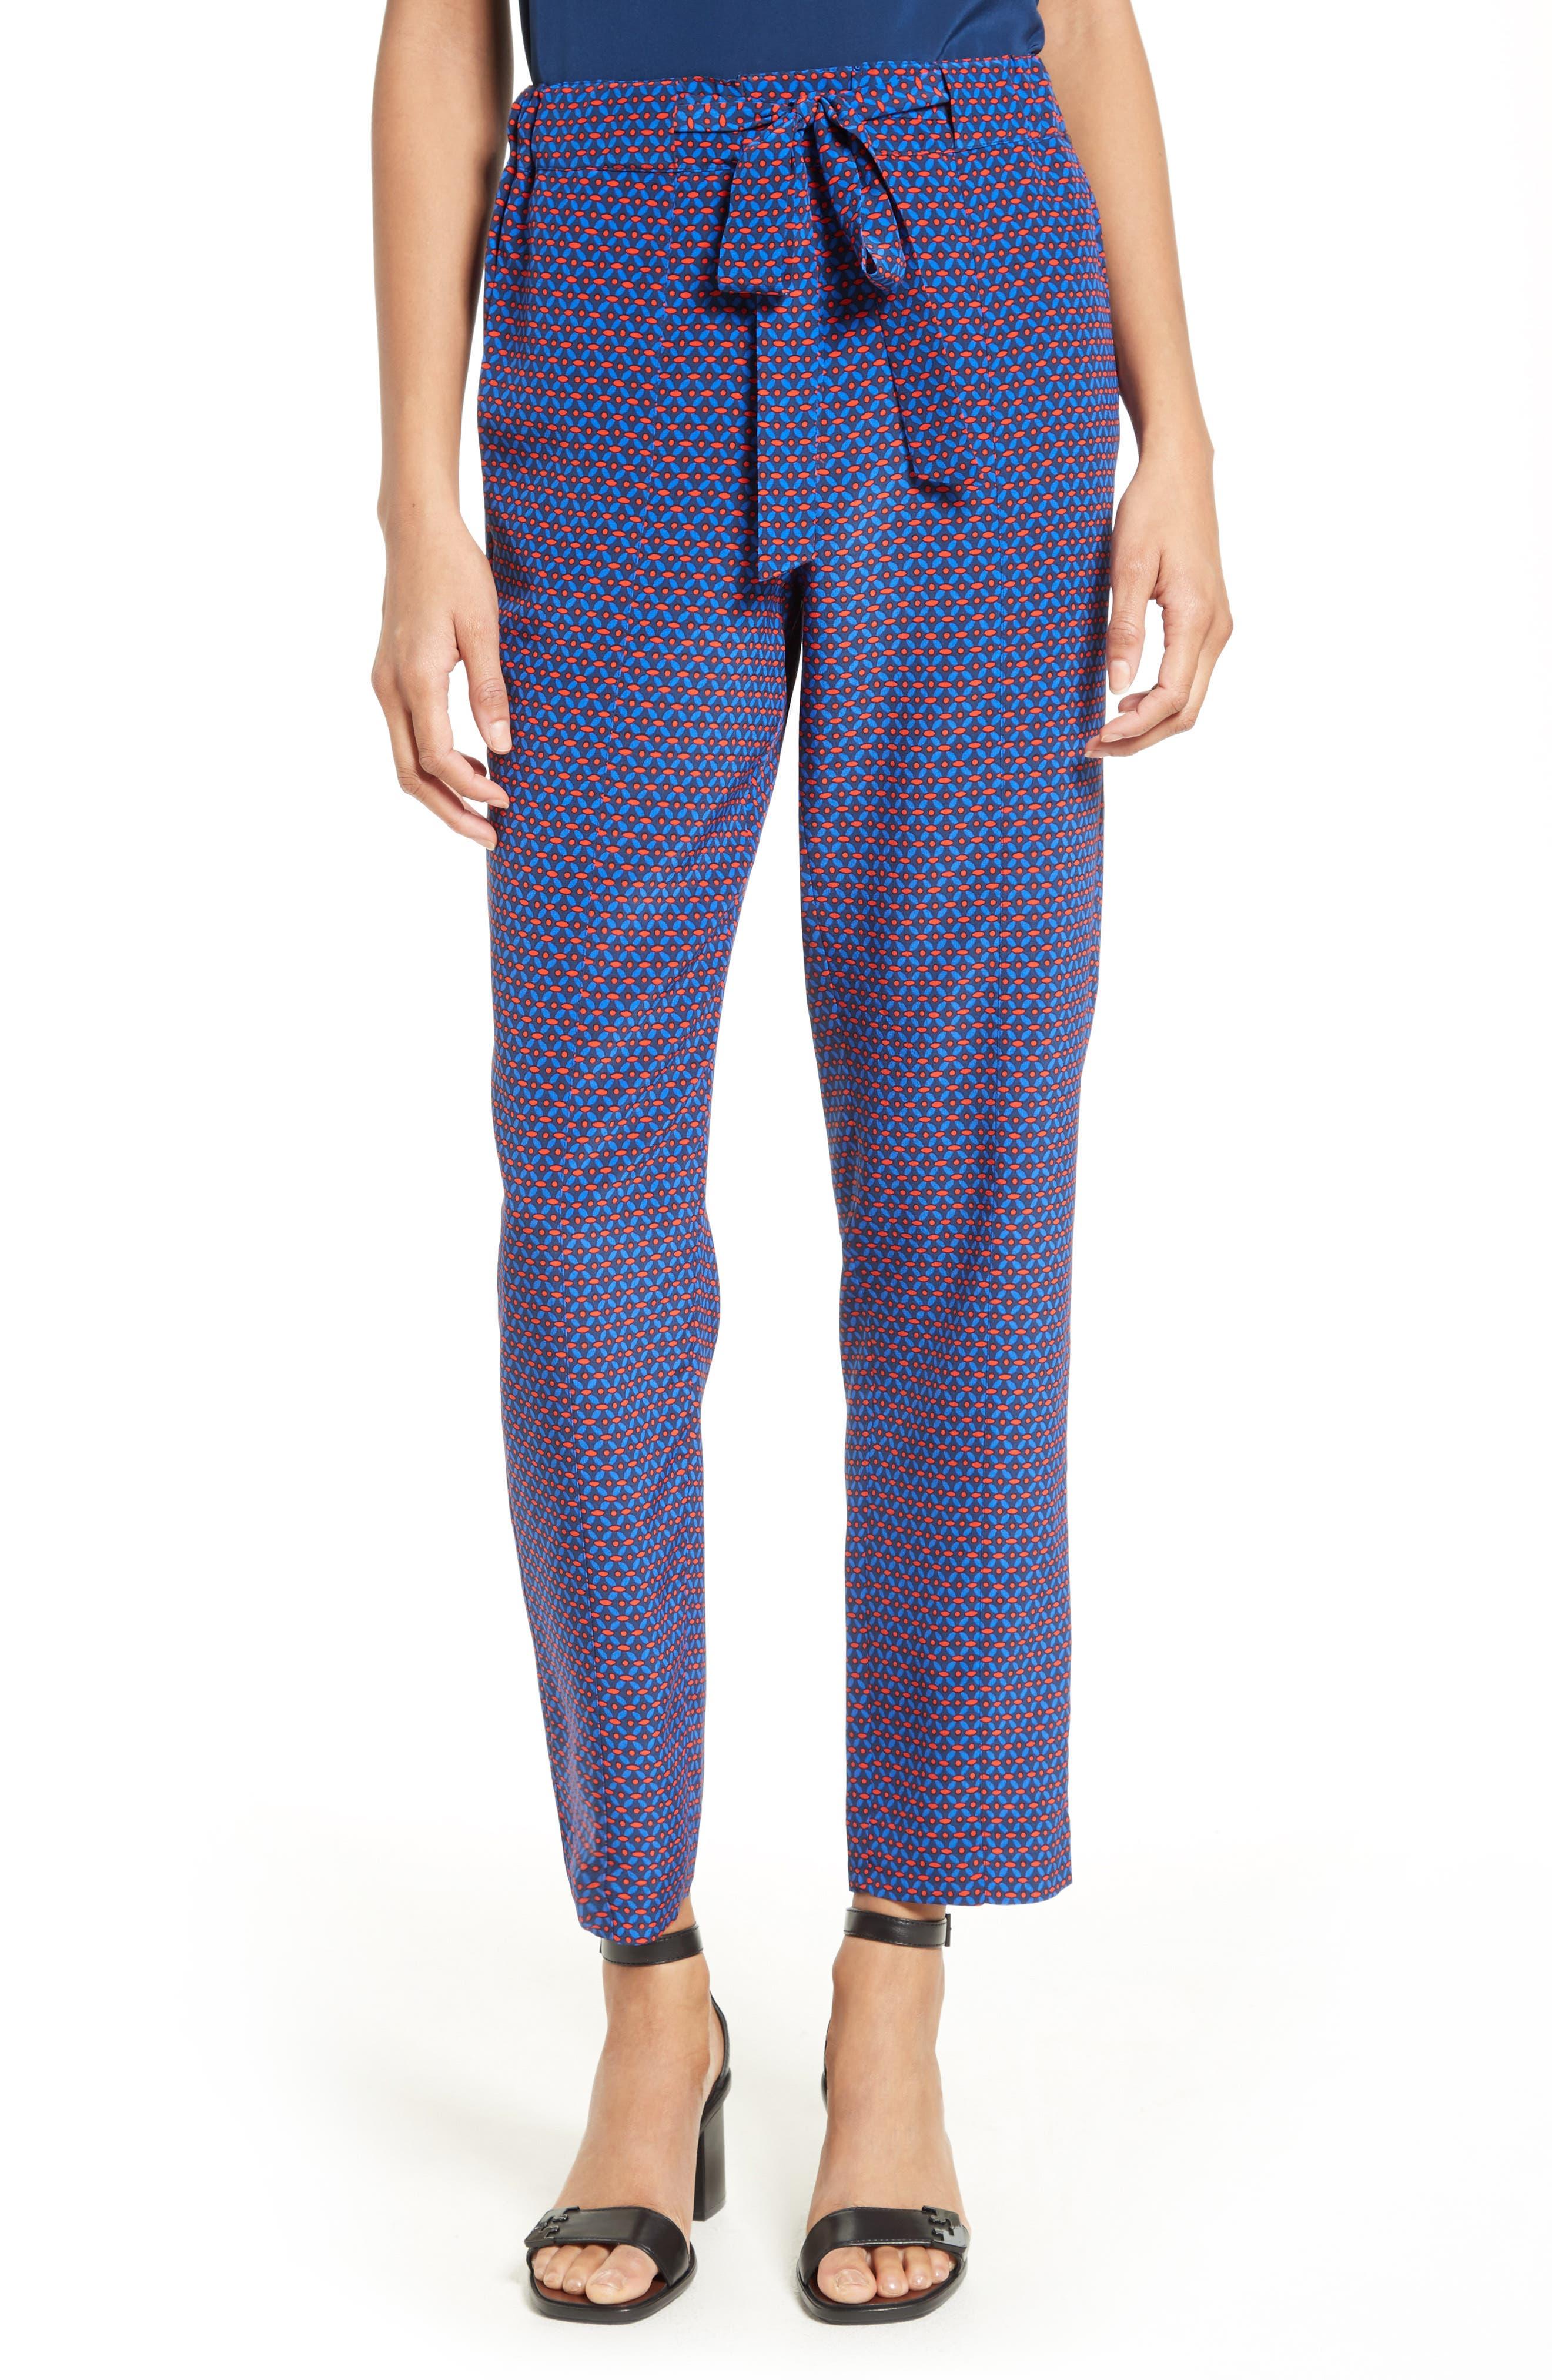 Tory Burch Talia Print Tie Front Pants